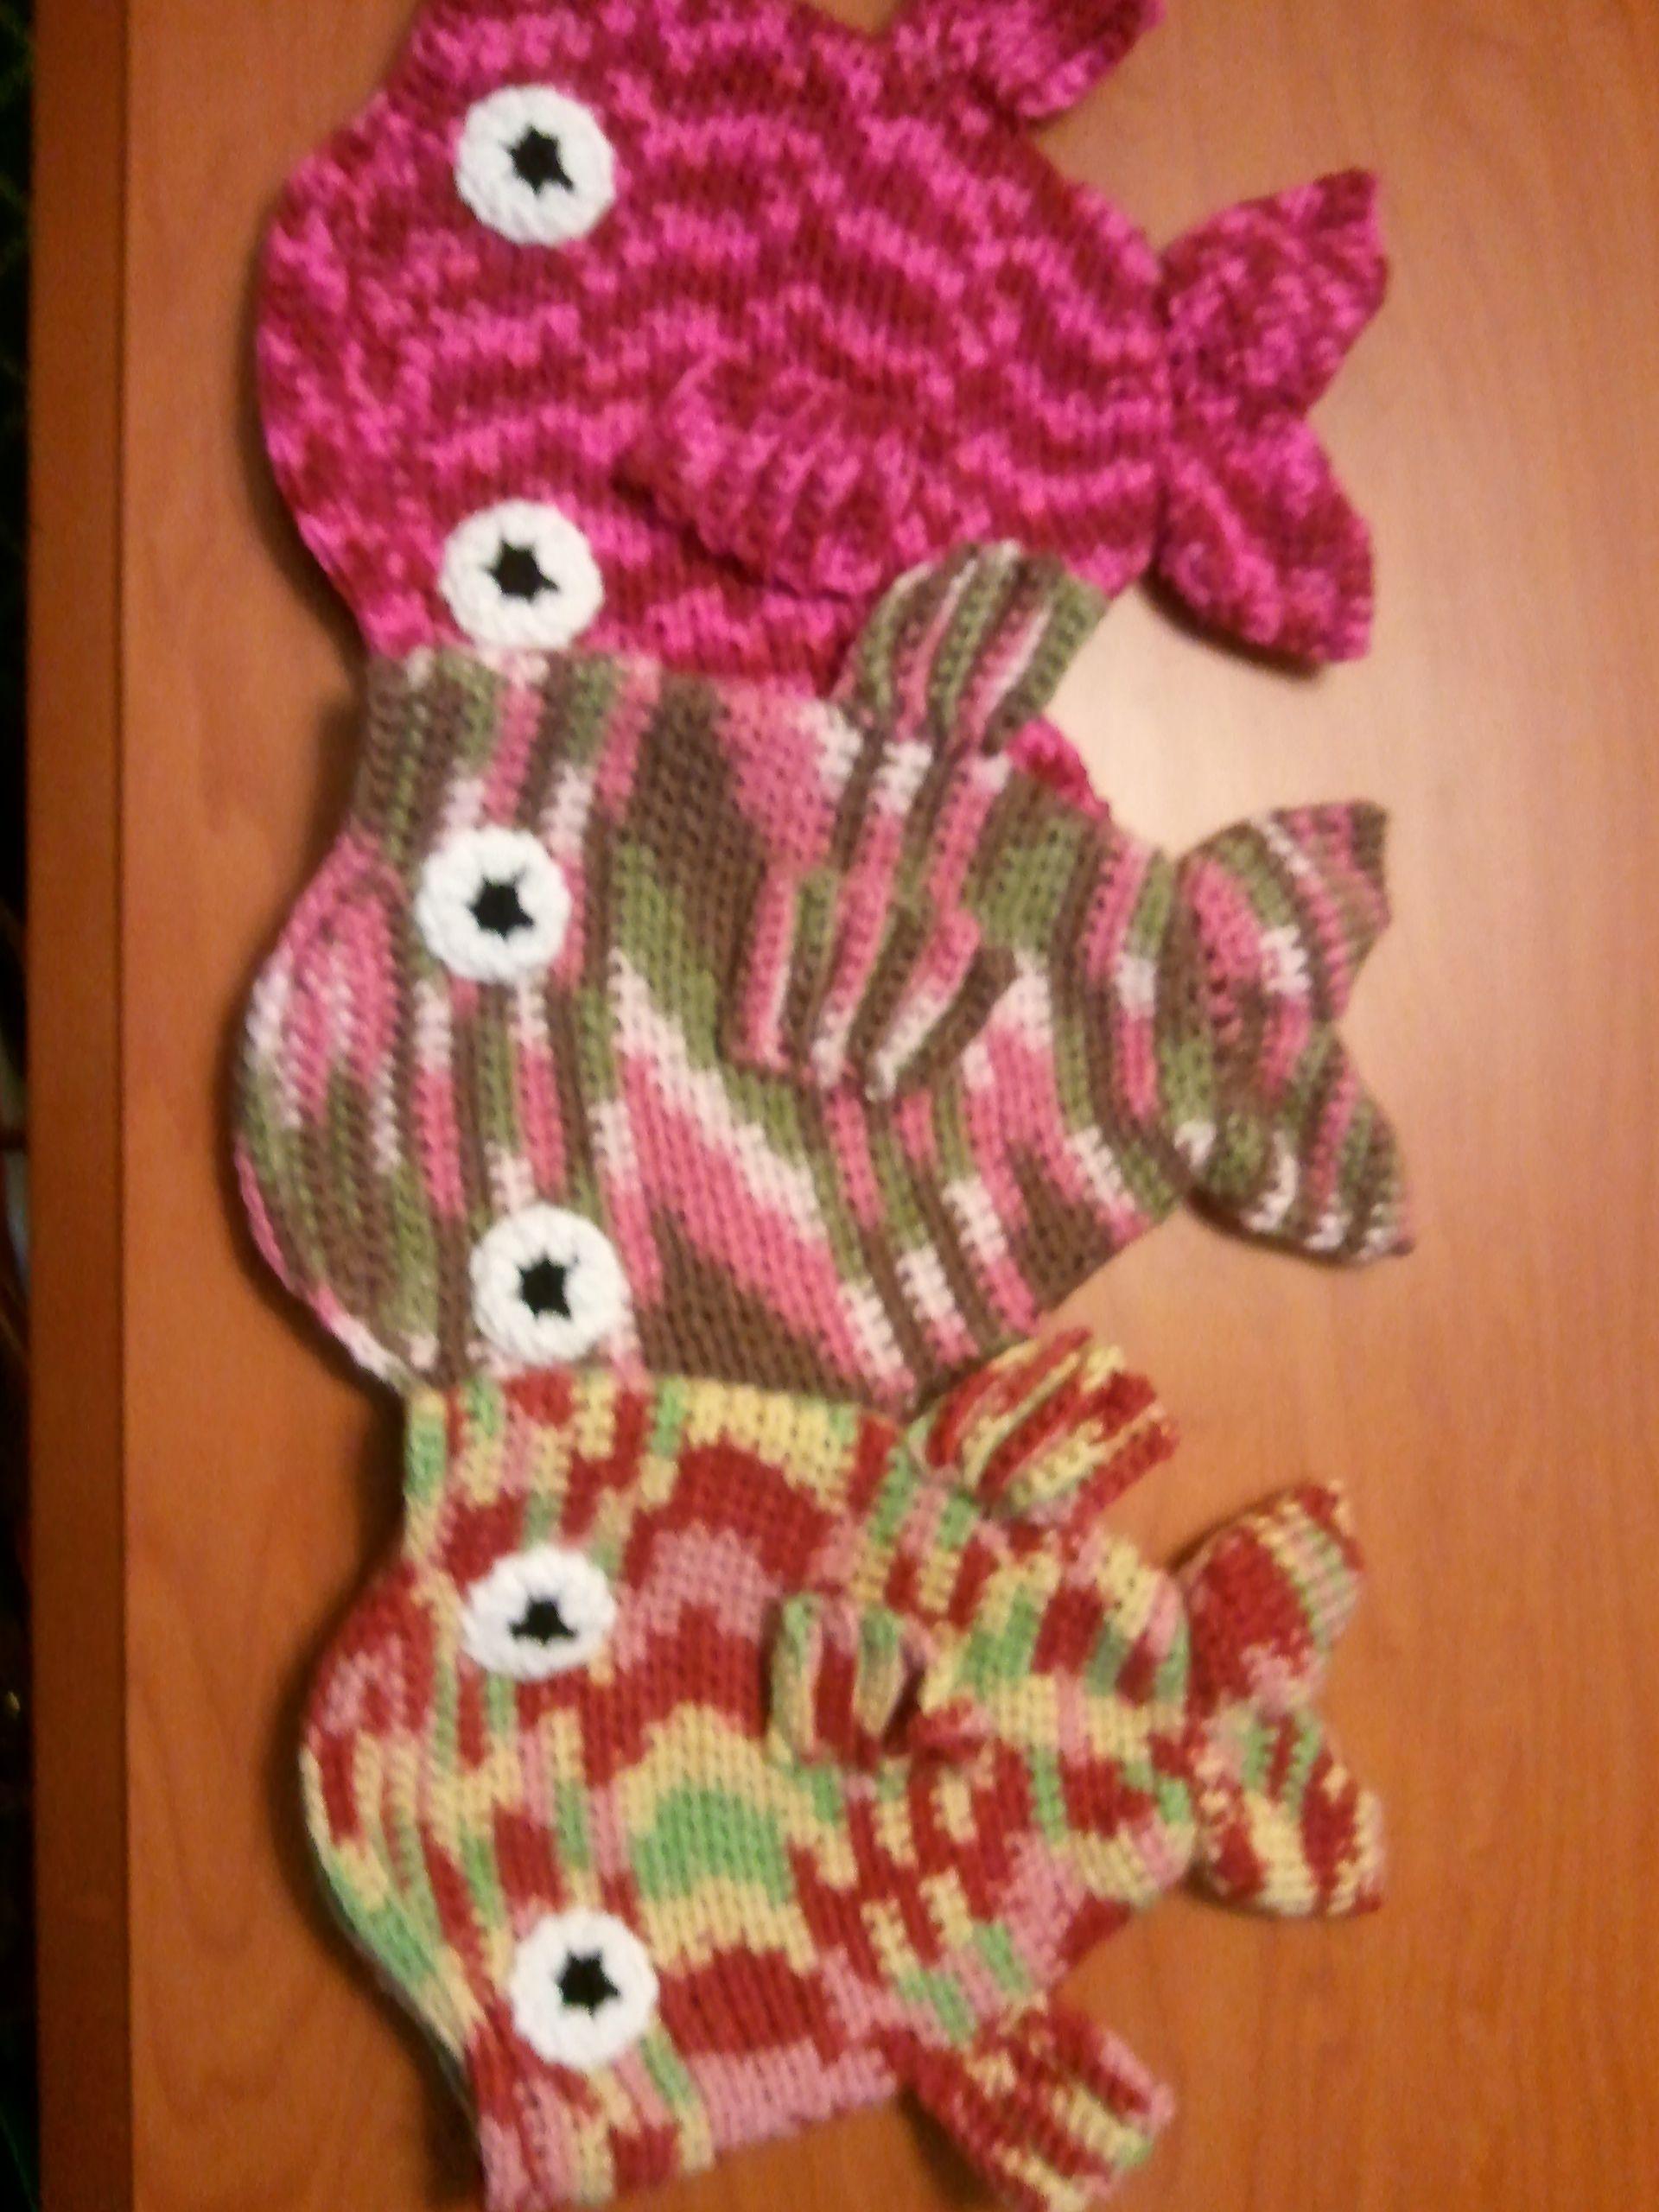 Crochet Fish Hats